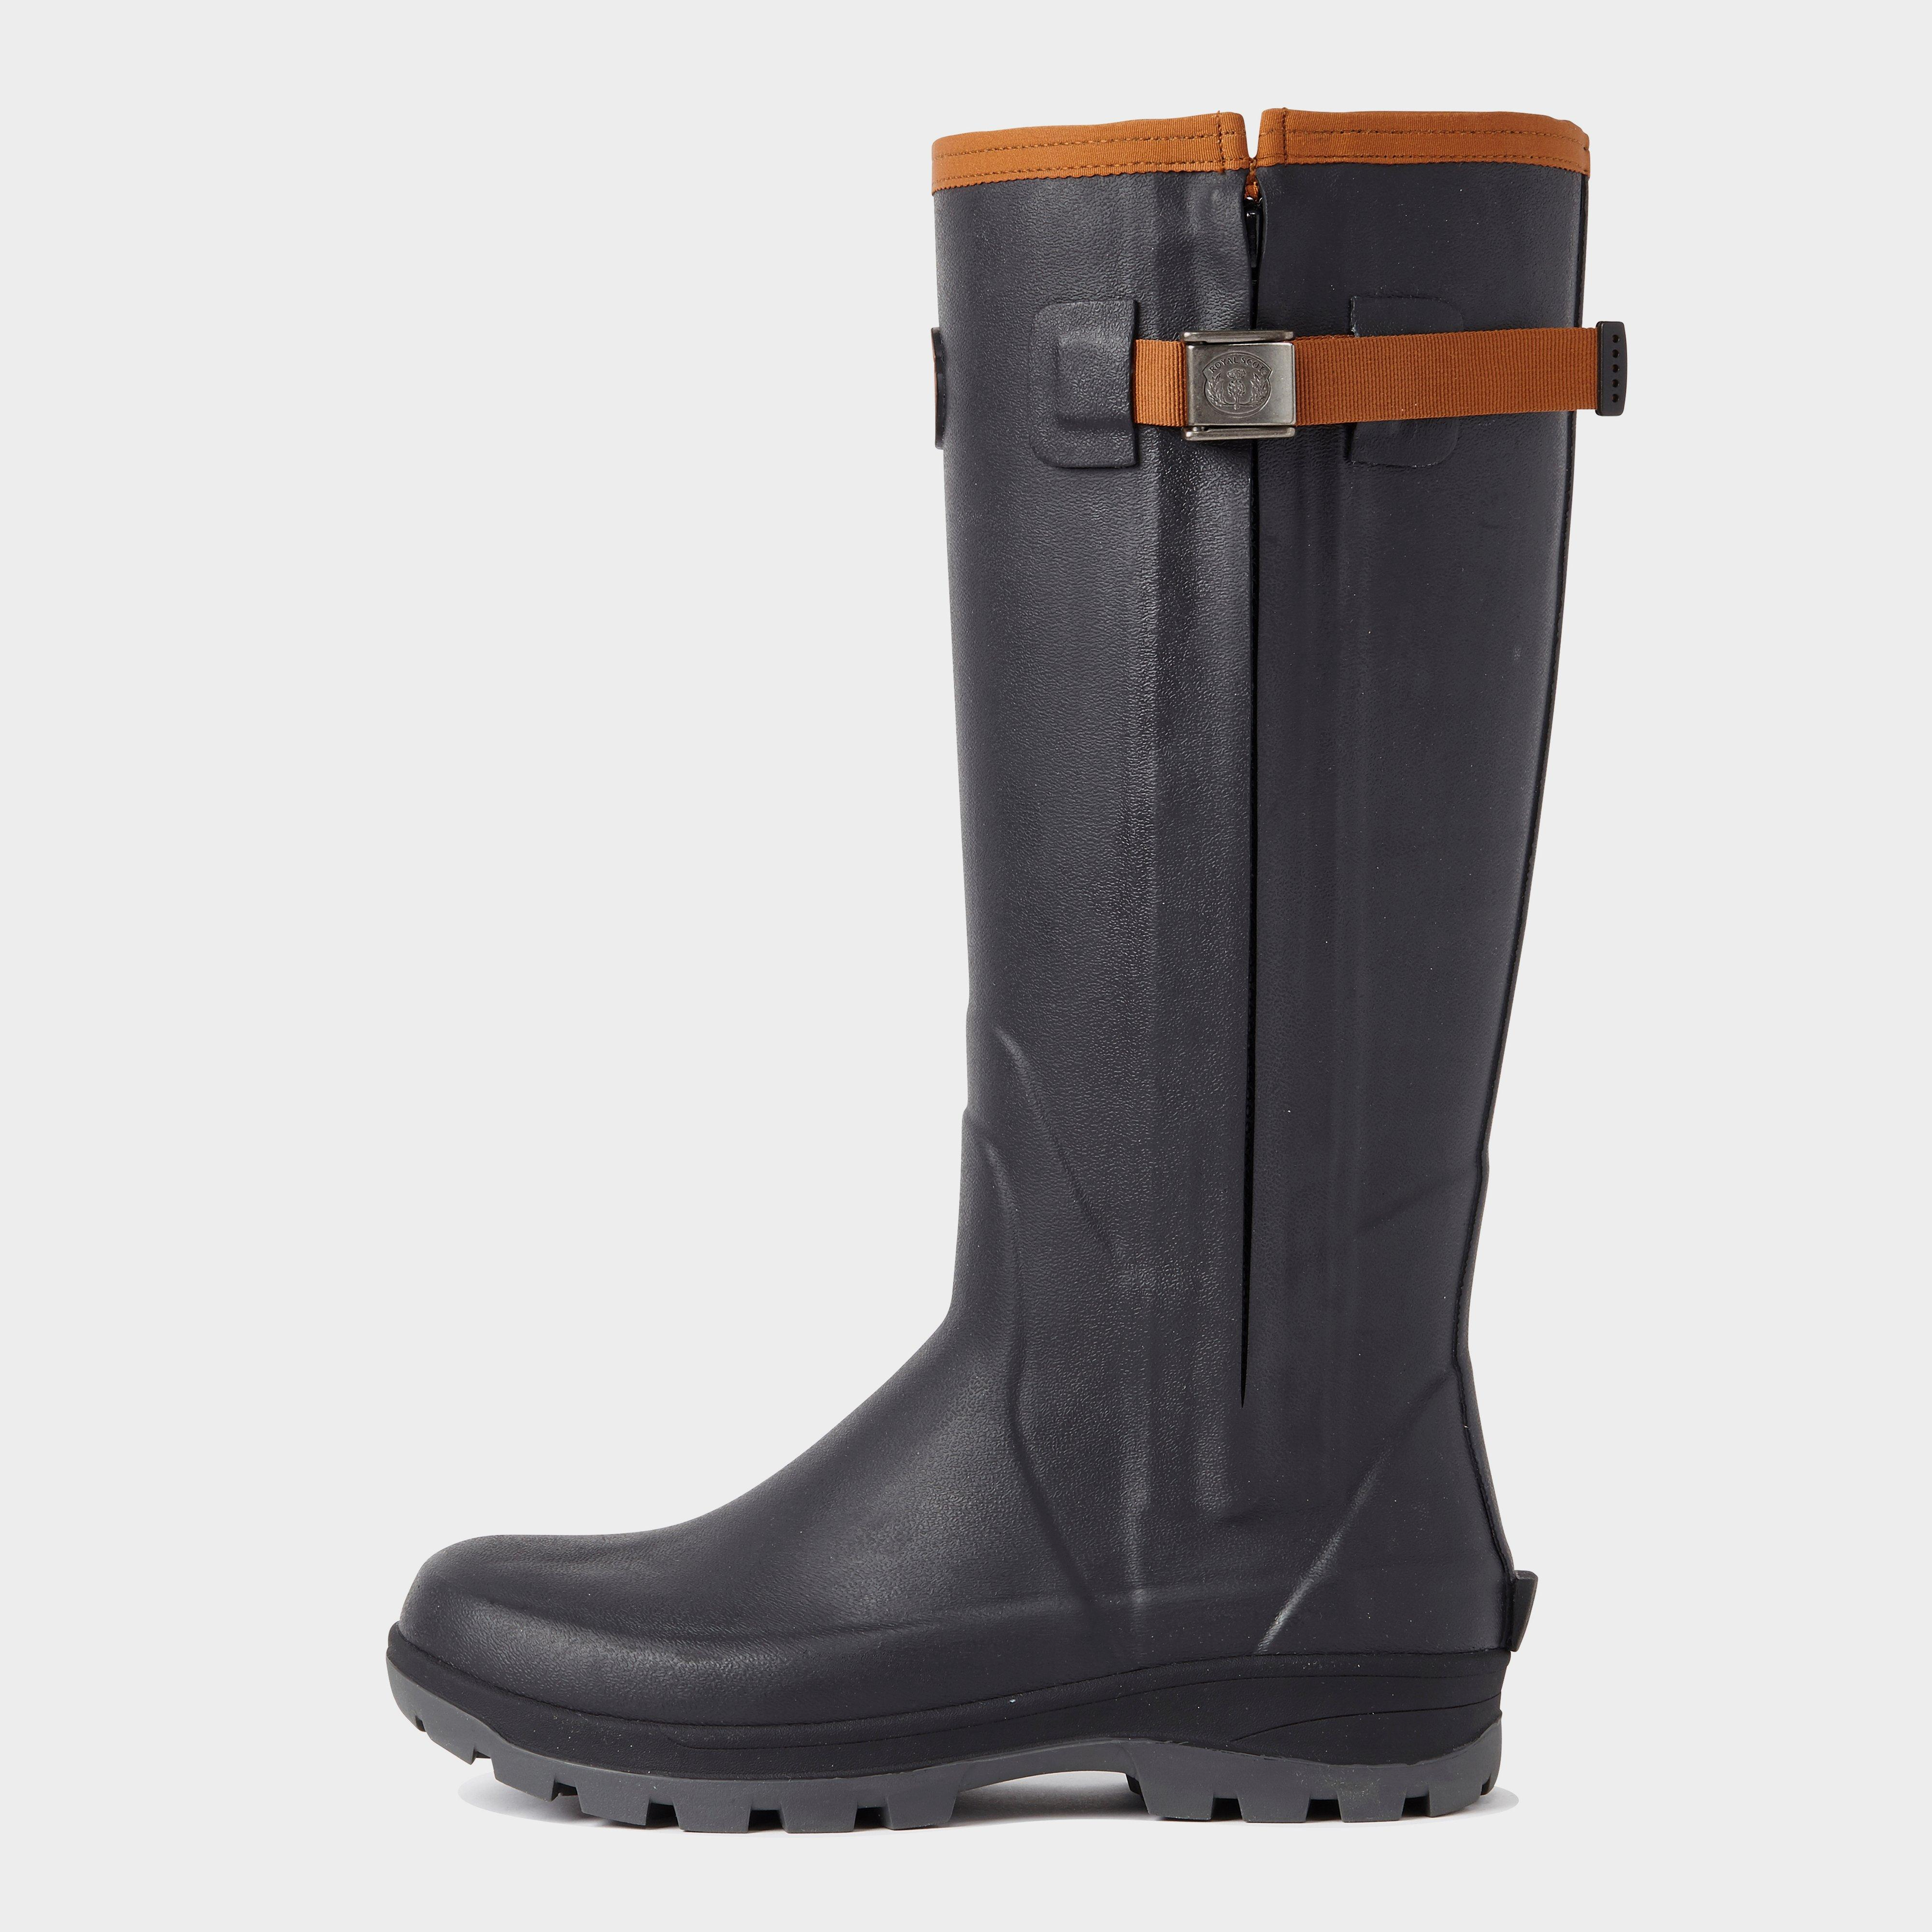 Royal Scot Women's Lomond Boot - Black/Black, Black